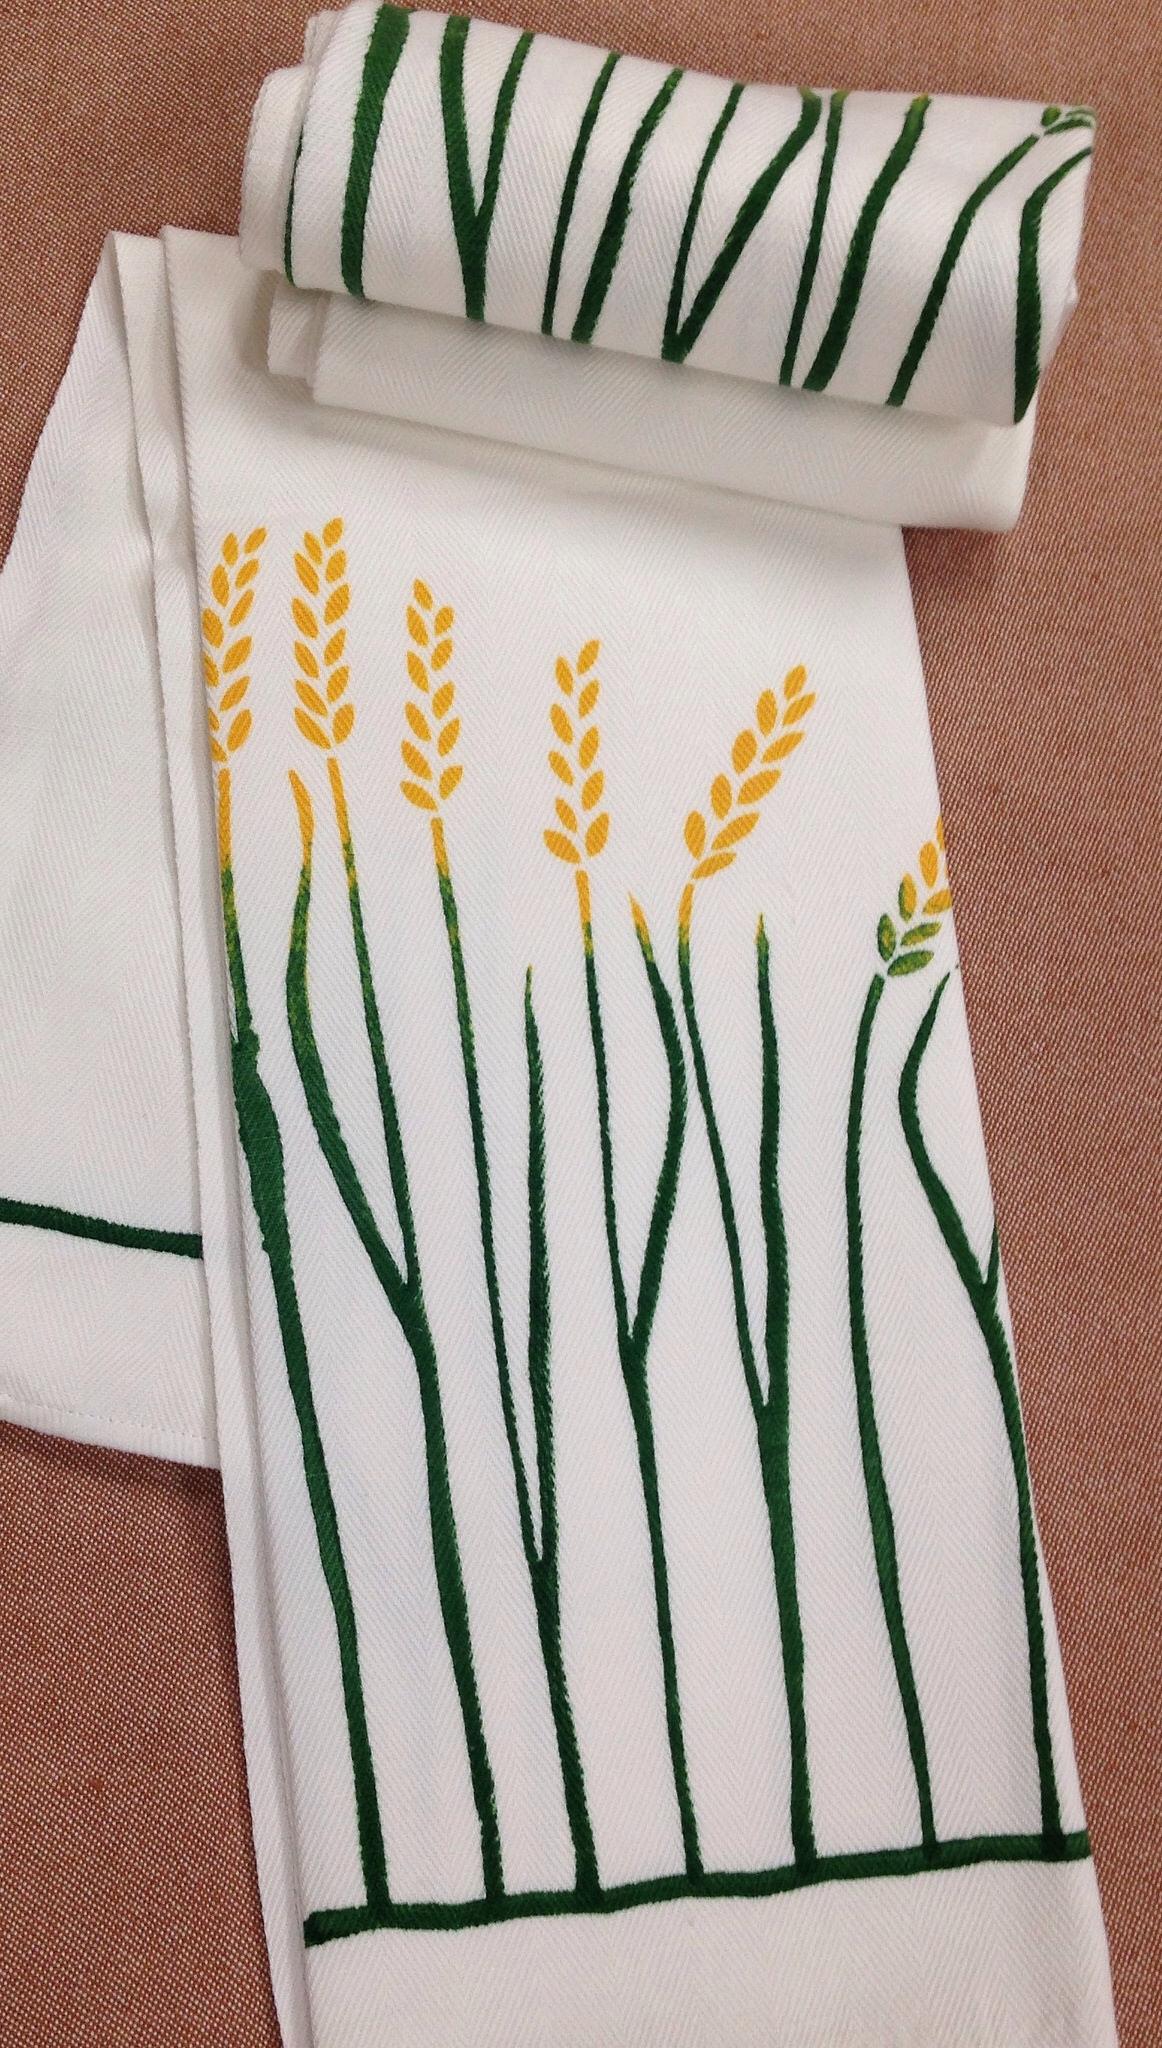 Wheat Kitchen Towel By Bertozzi Italian Bed Bath And